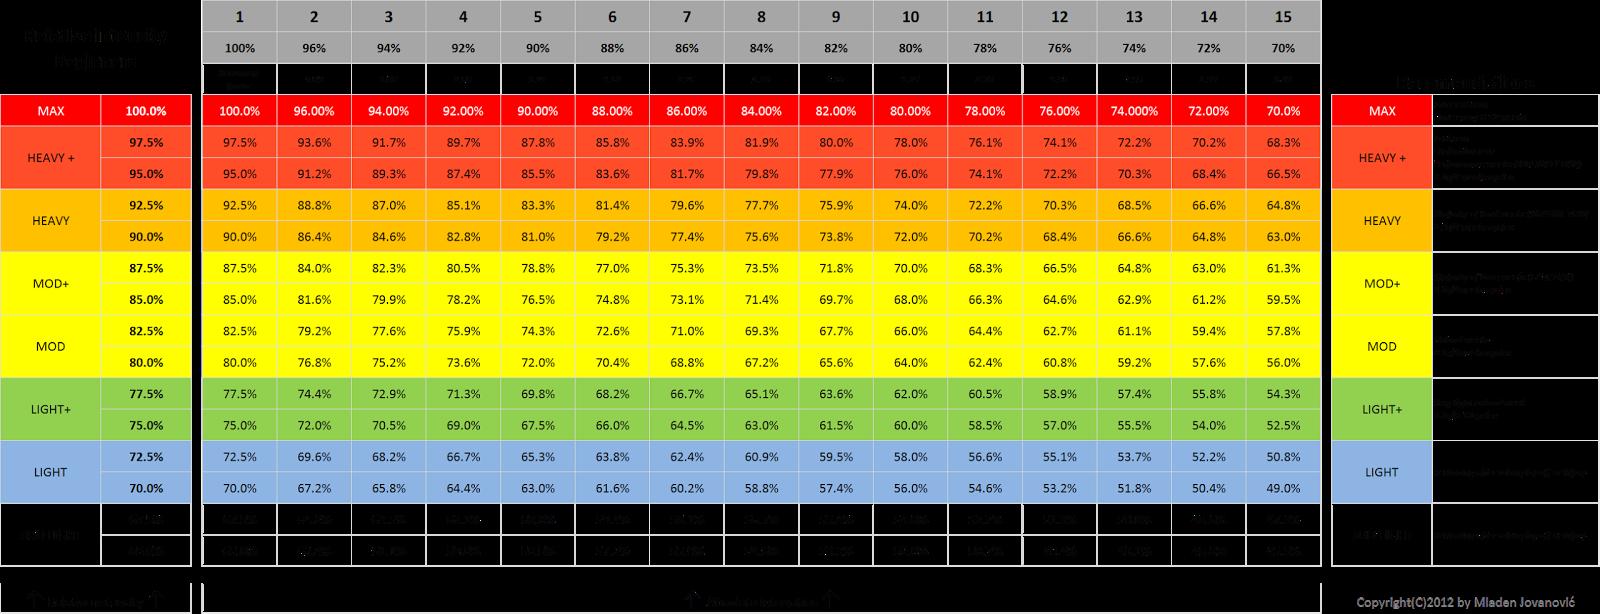 Relative Intensity Table